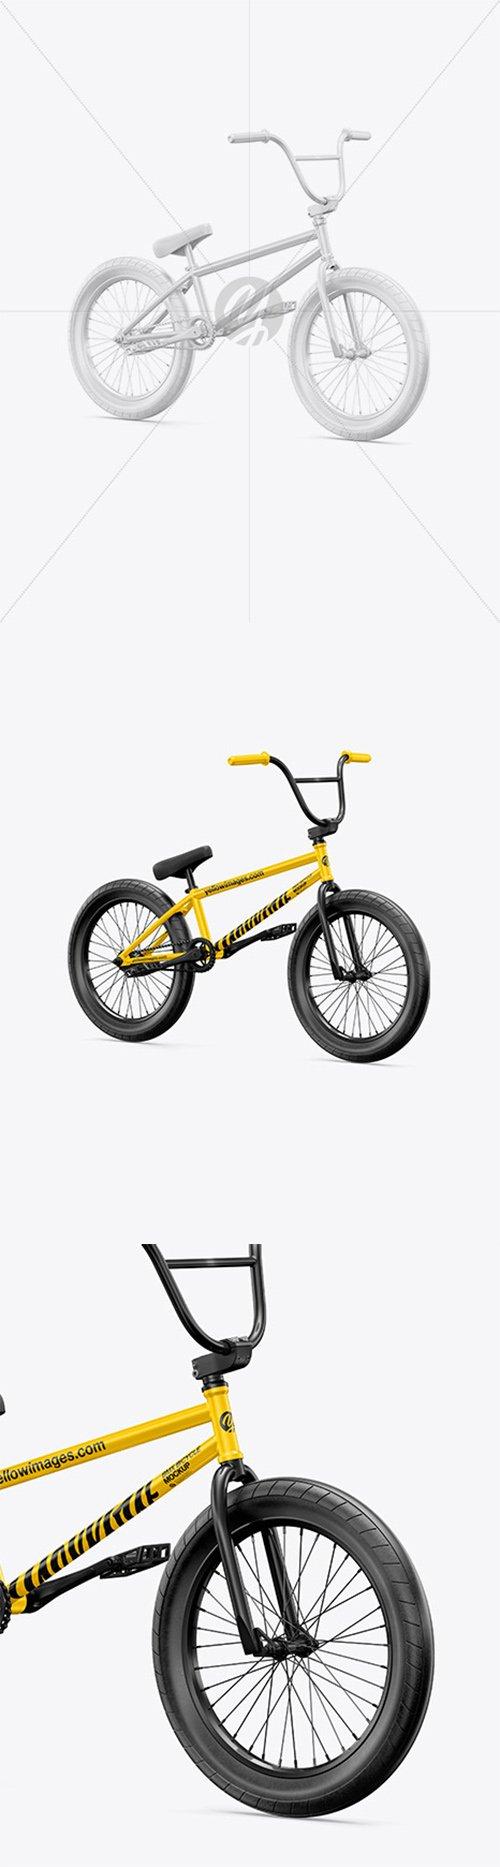 BMX Bicycle Mockup - Half Side View 64933 TIF